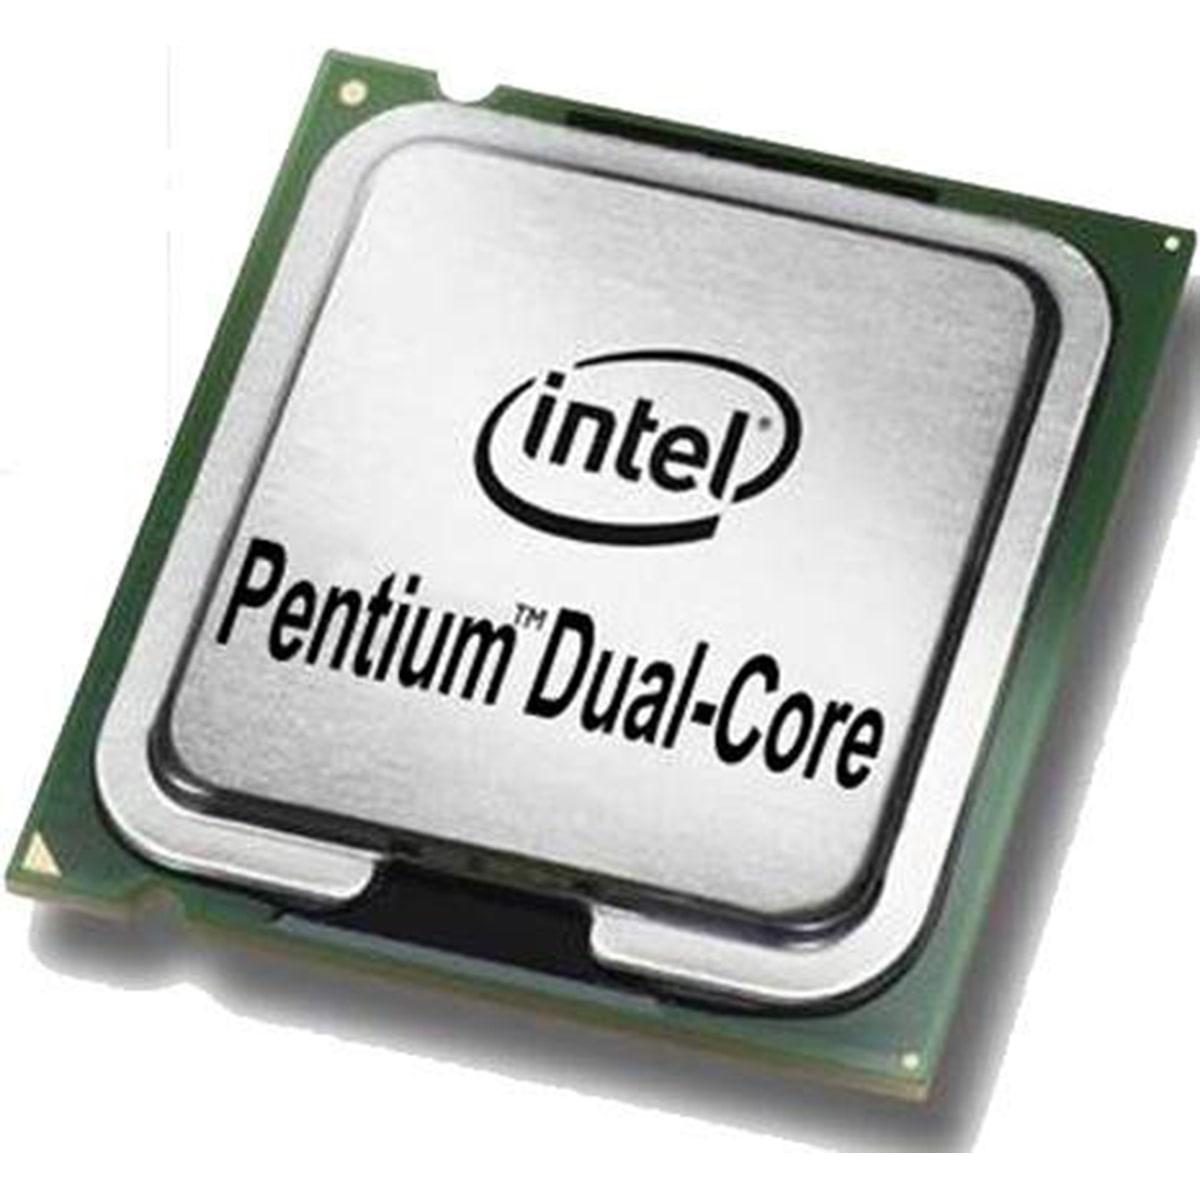 Processador Intel Dual Core E2200 2,20Ghz 1M Cache 800 MHz Socket 775 - Seminovo